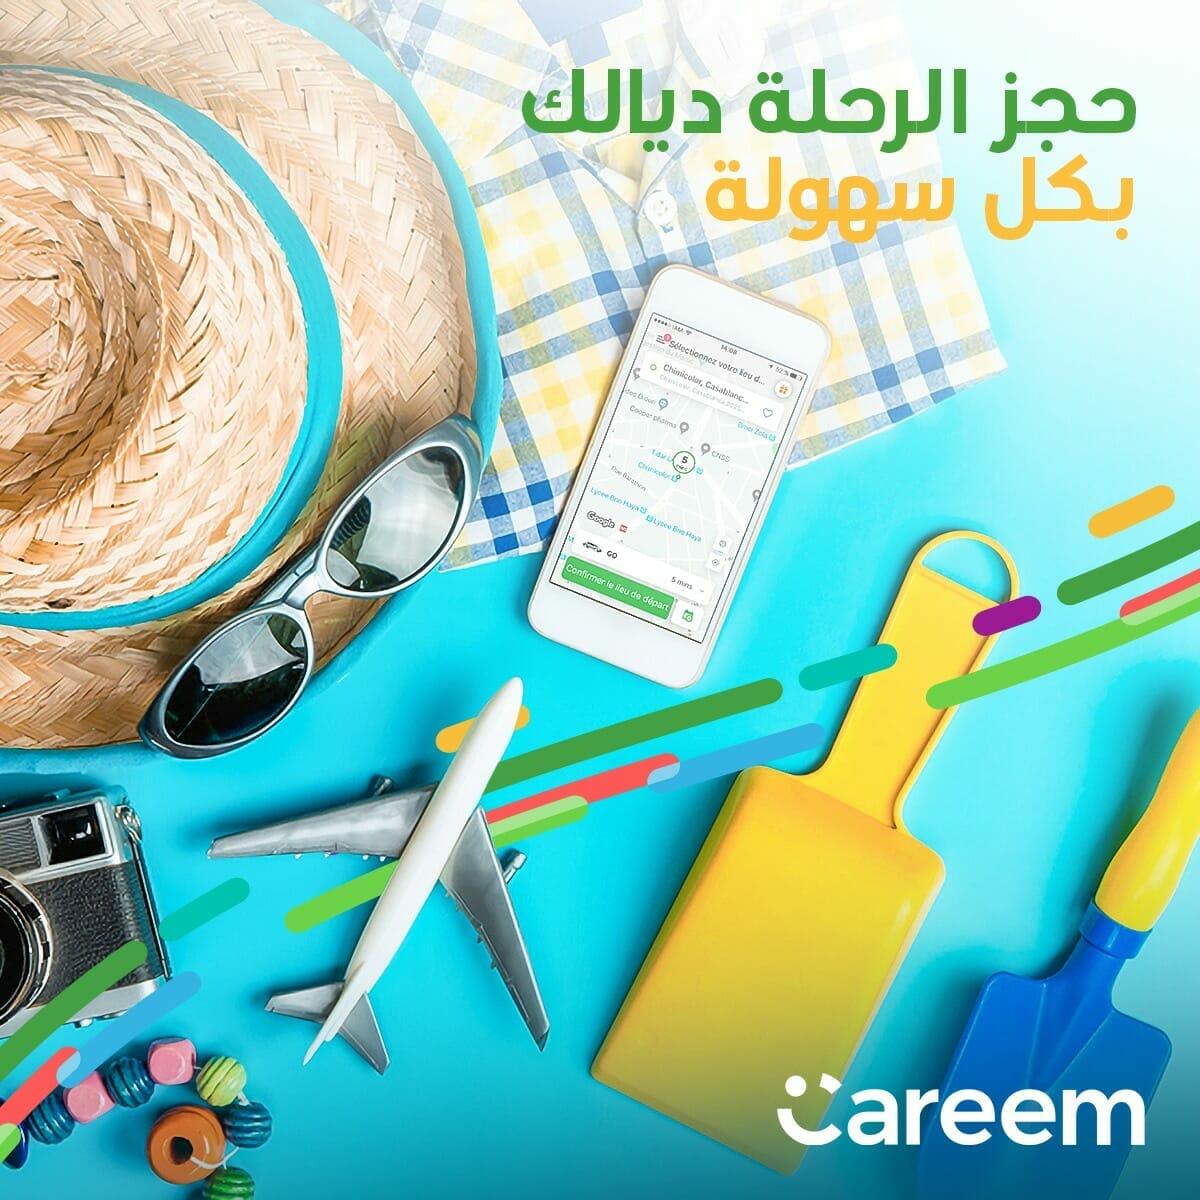 Careem-23